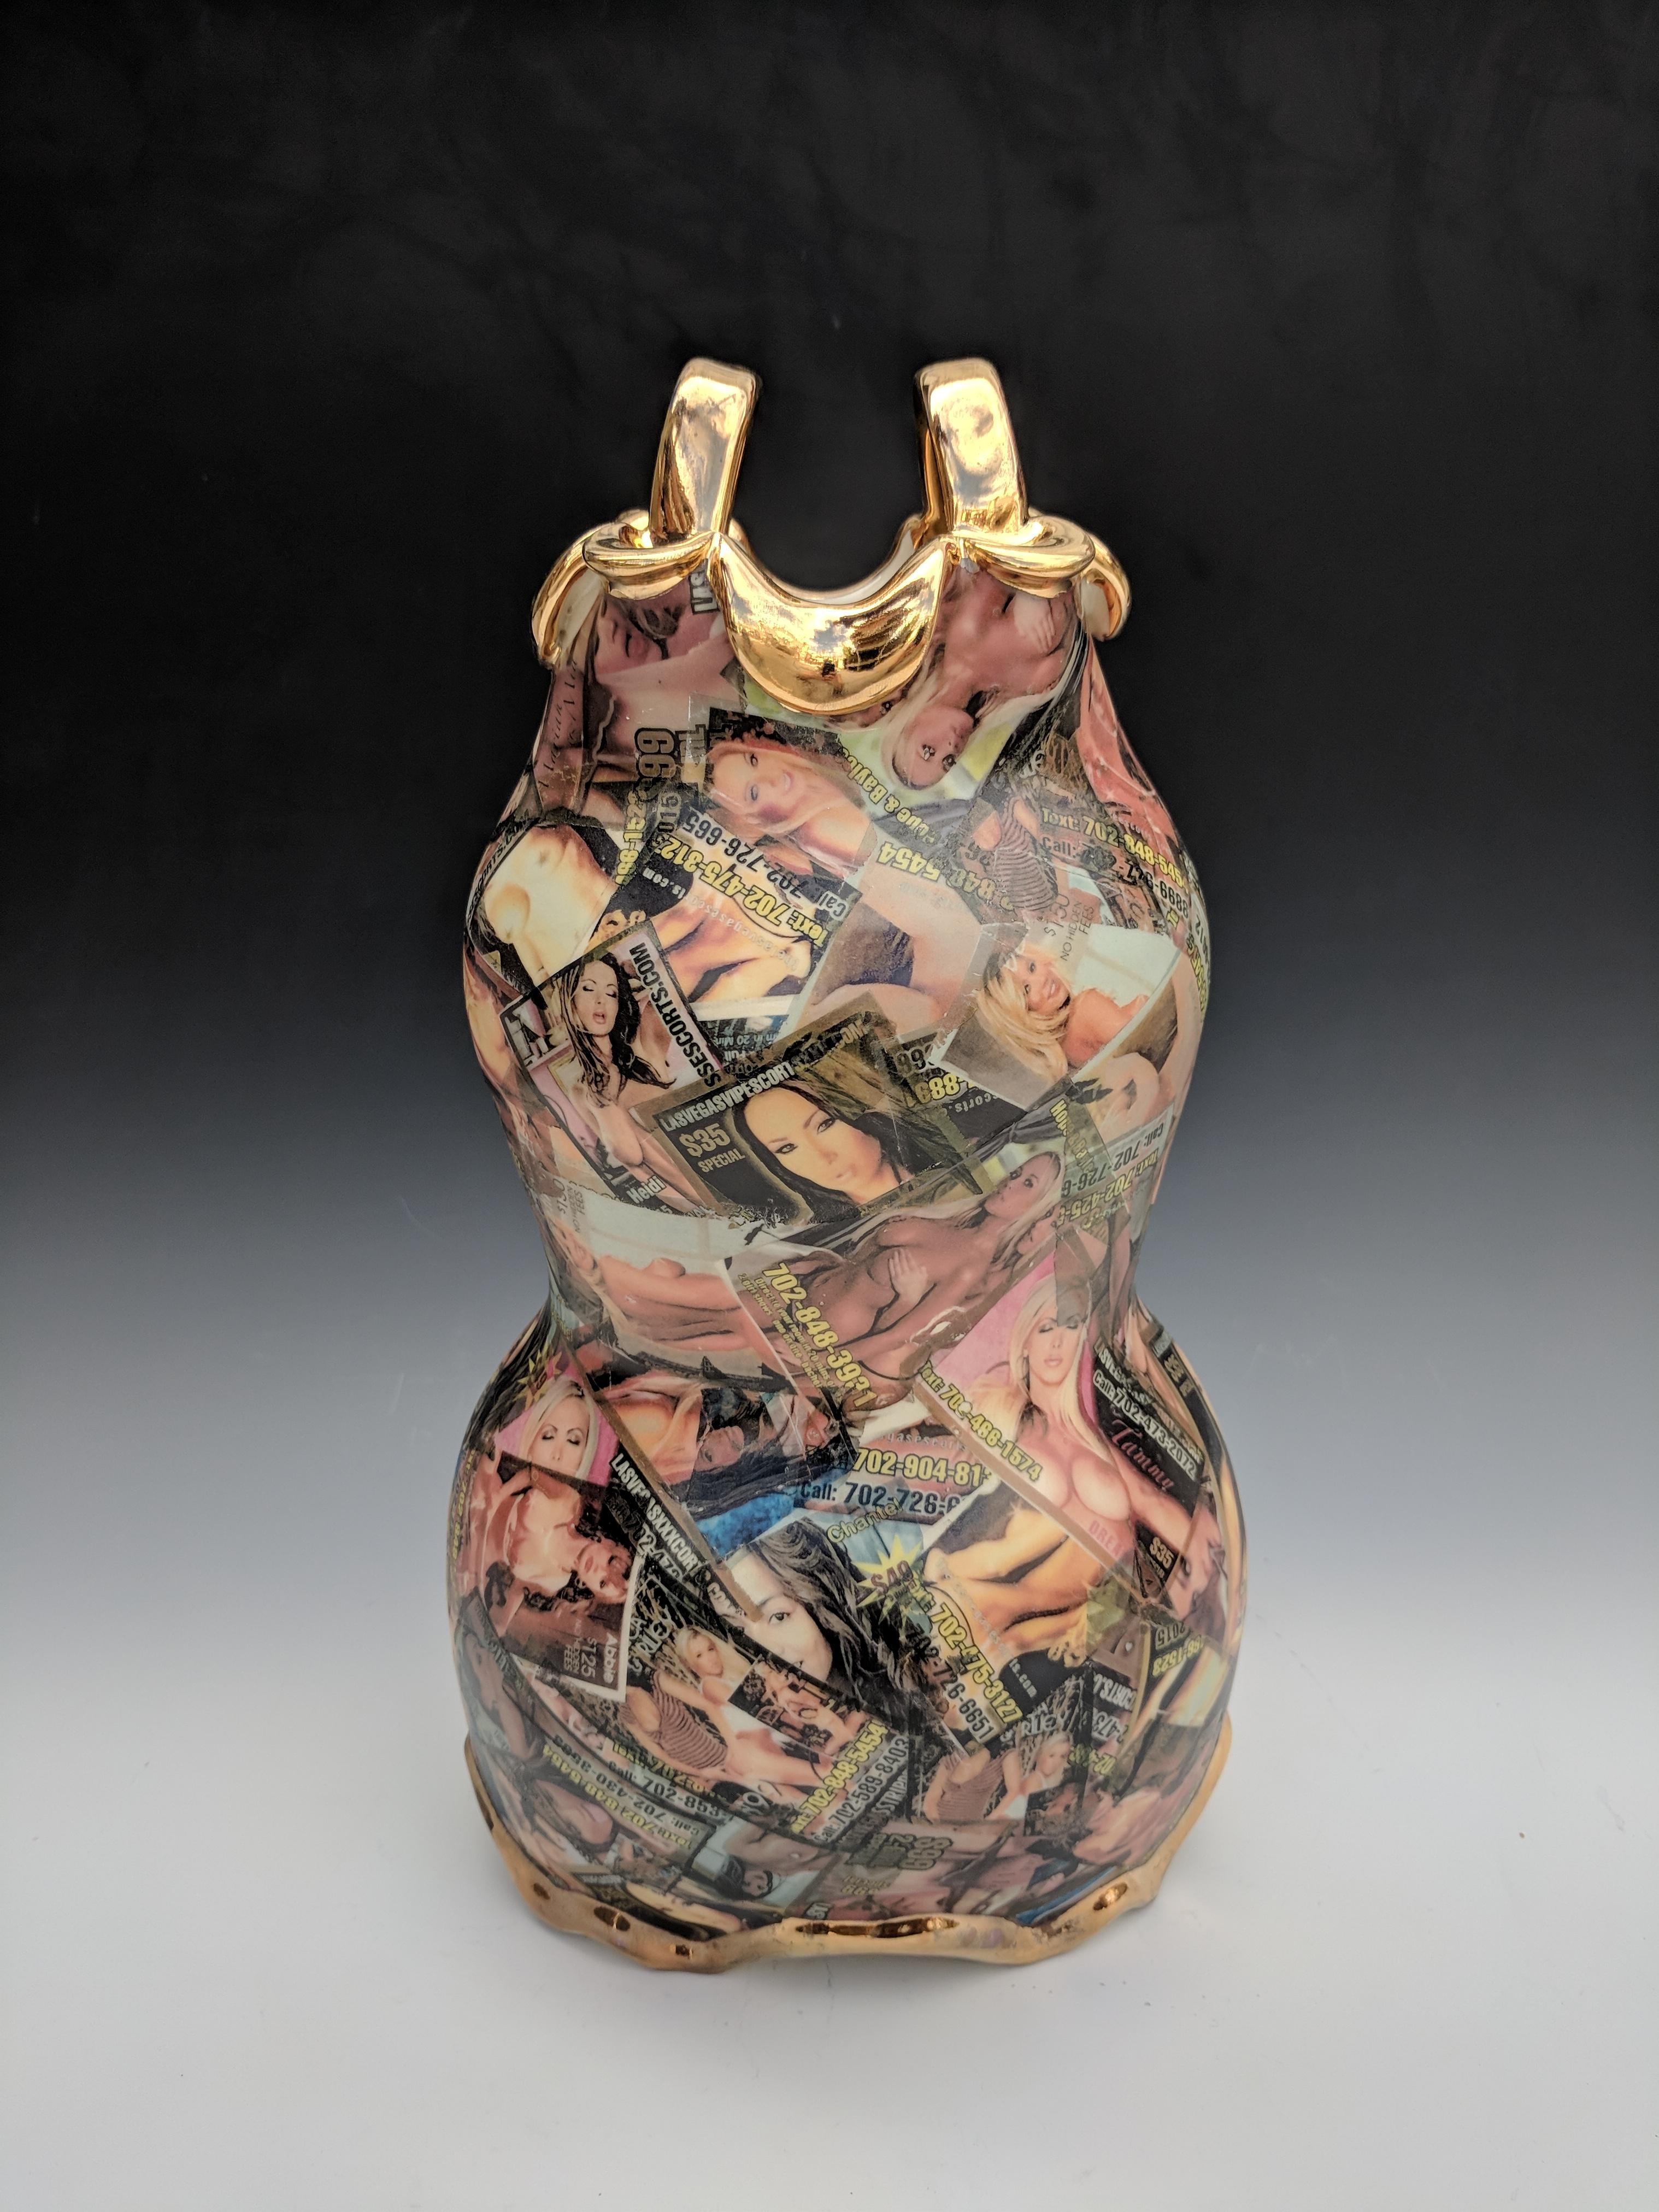 Nevada Prostitution Vase (Detail)